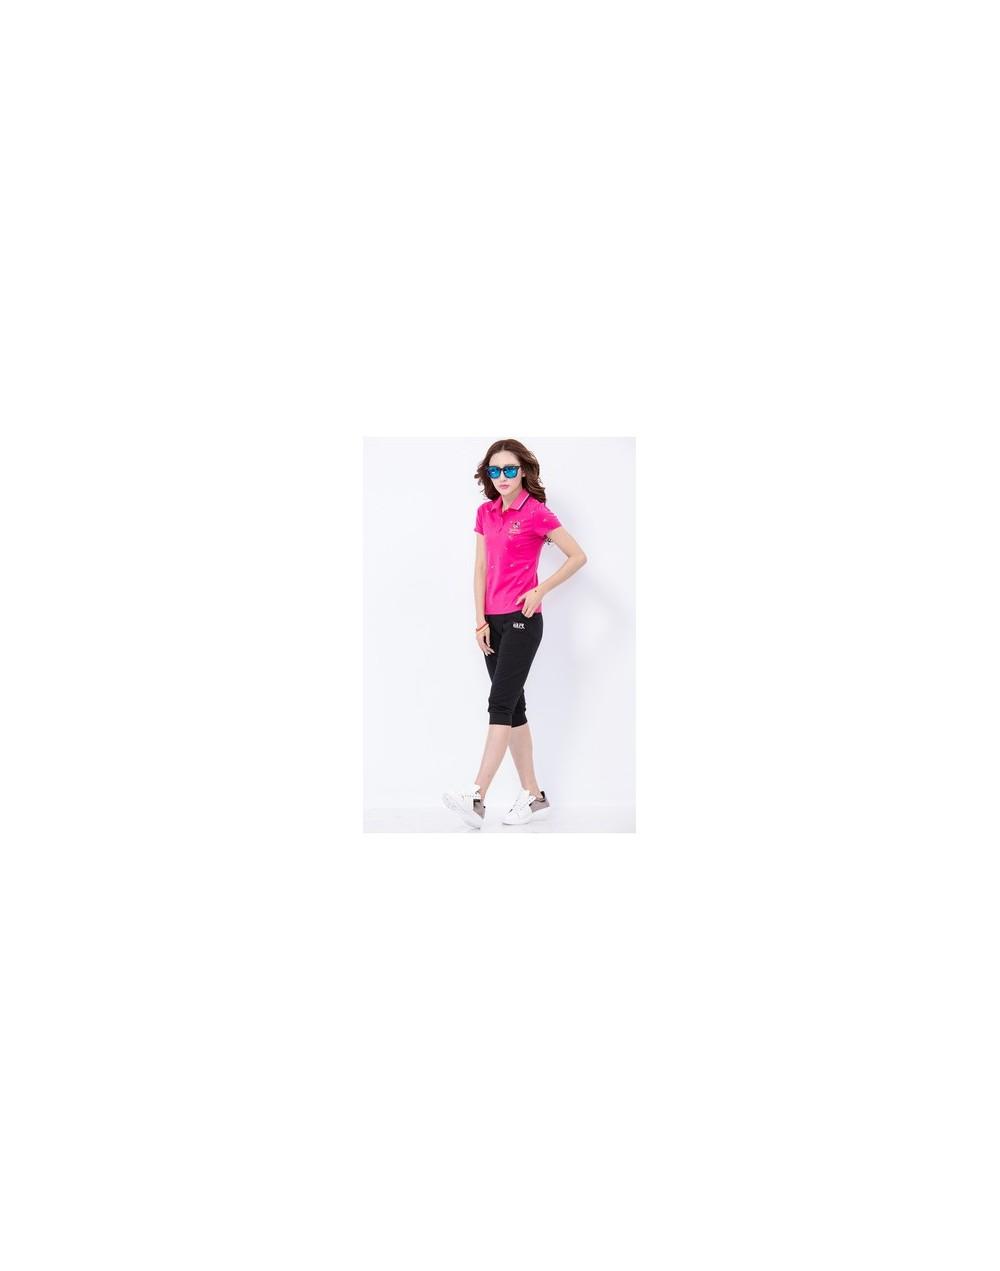 2019 Summer Polos The Woman Casual Short Sleeve Slim Polos Shirts Tops Camisas Mujer Cotton Polos Shirt Hot Sale L0519 - pin...